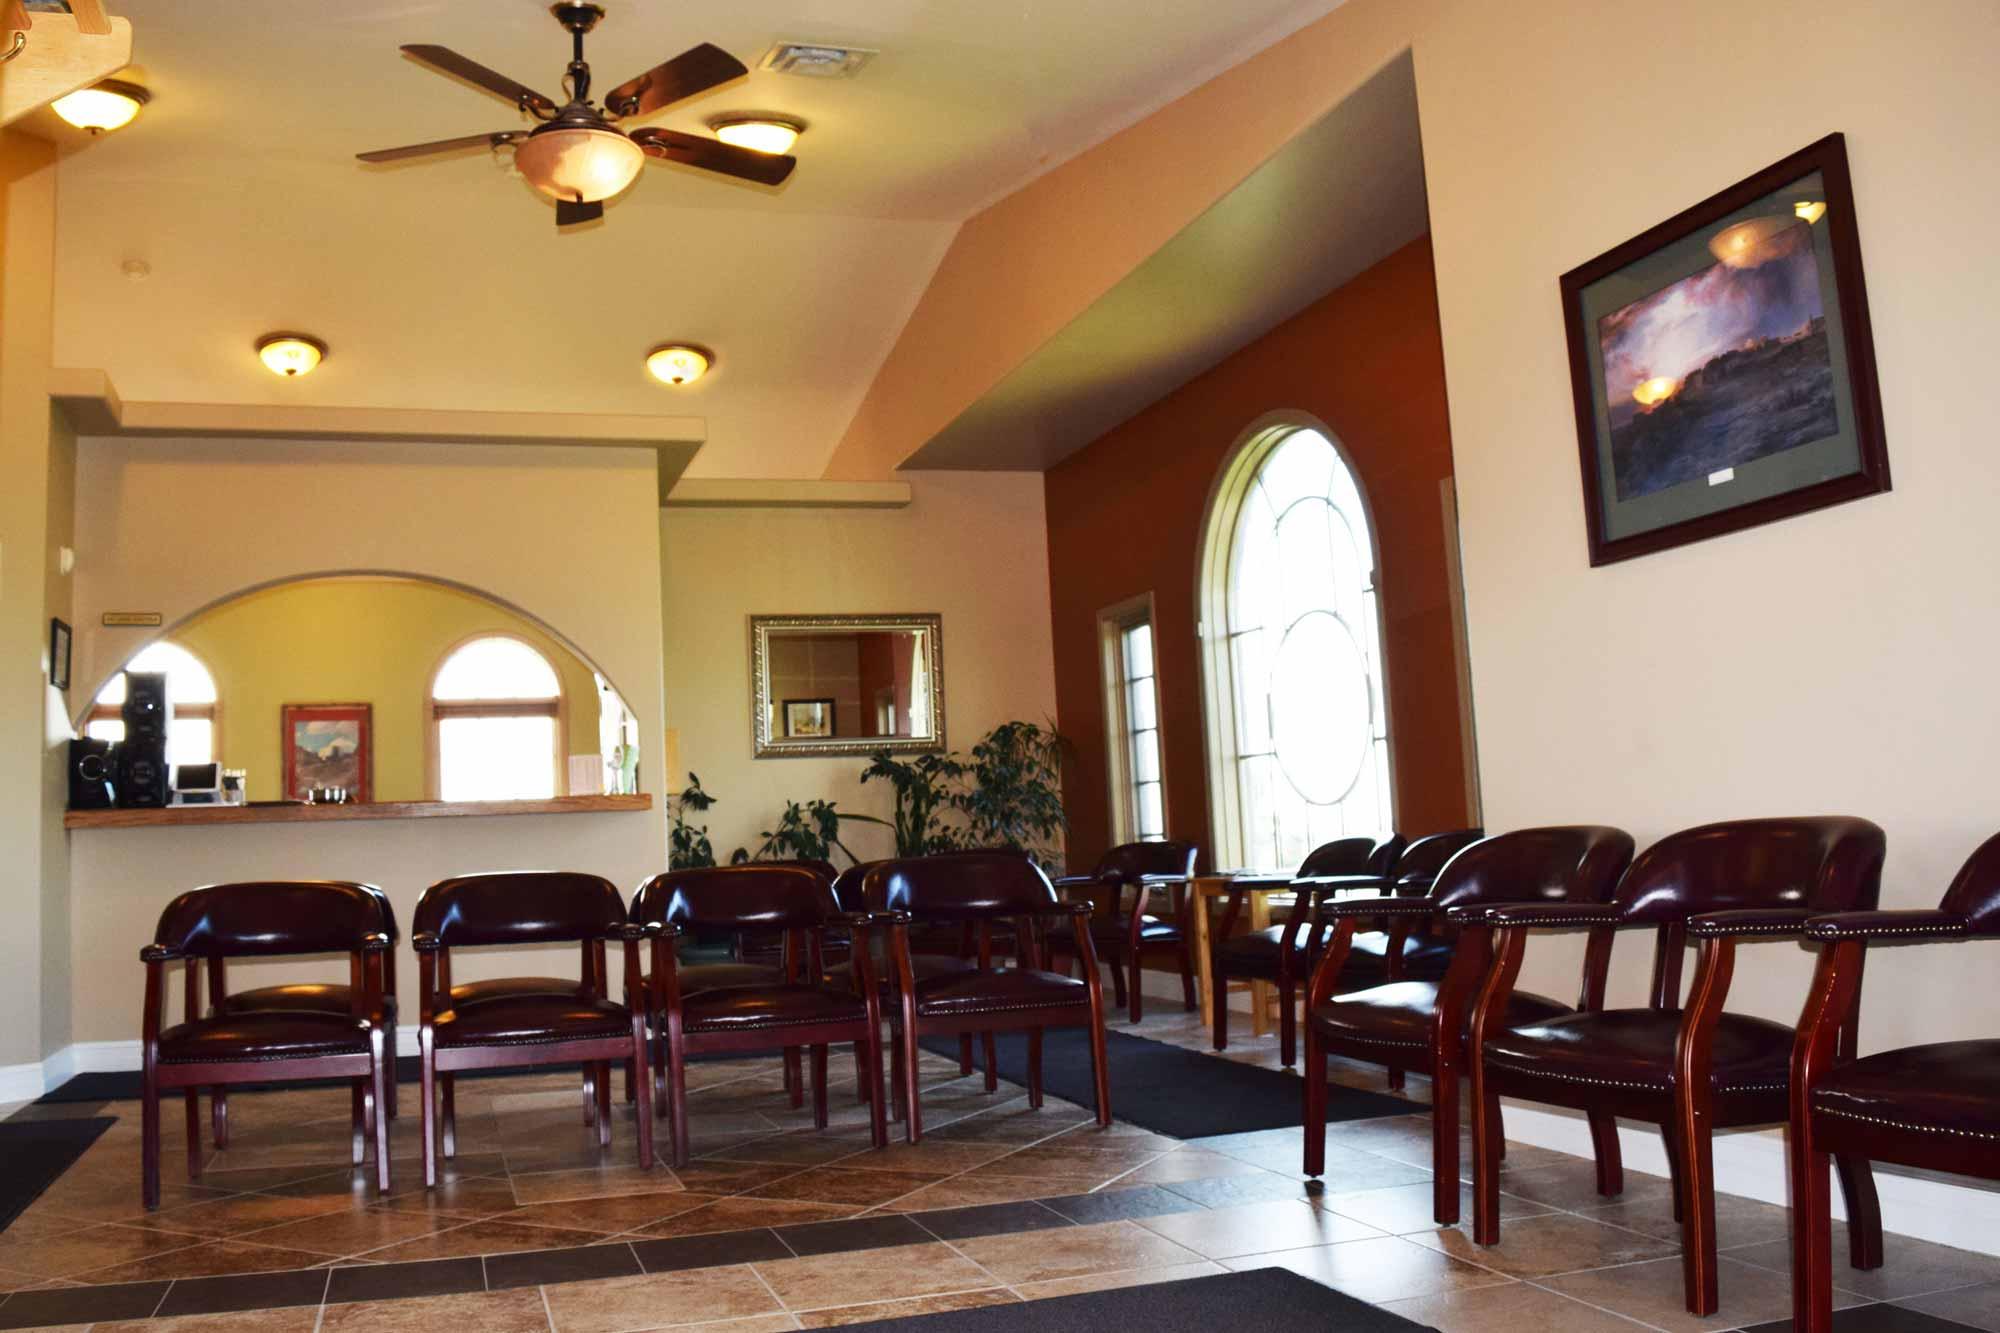 high-plains-surgical-associates-building-waiting-room-2.jpg